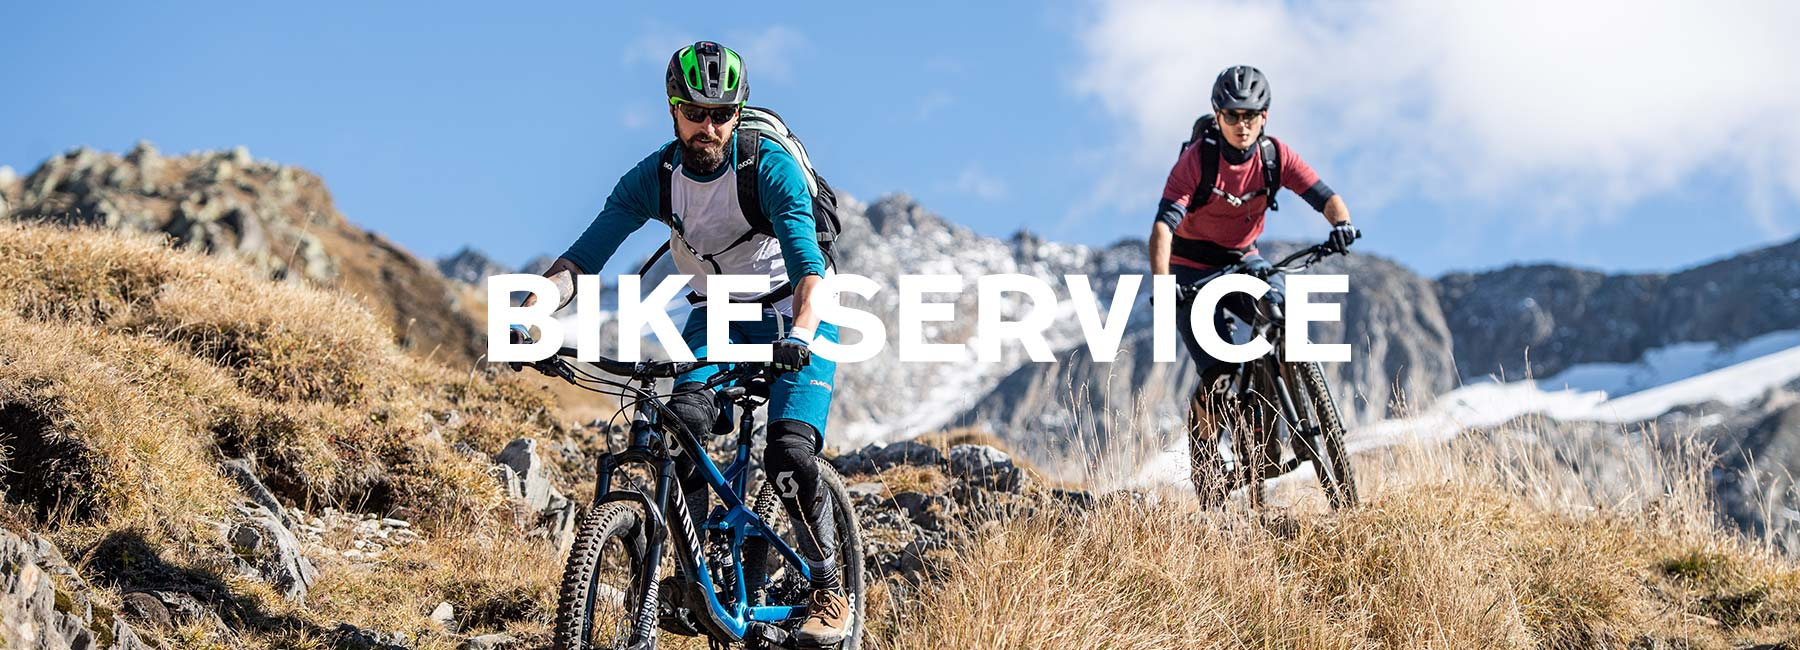 Bike Service Andermatt